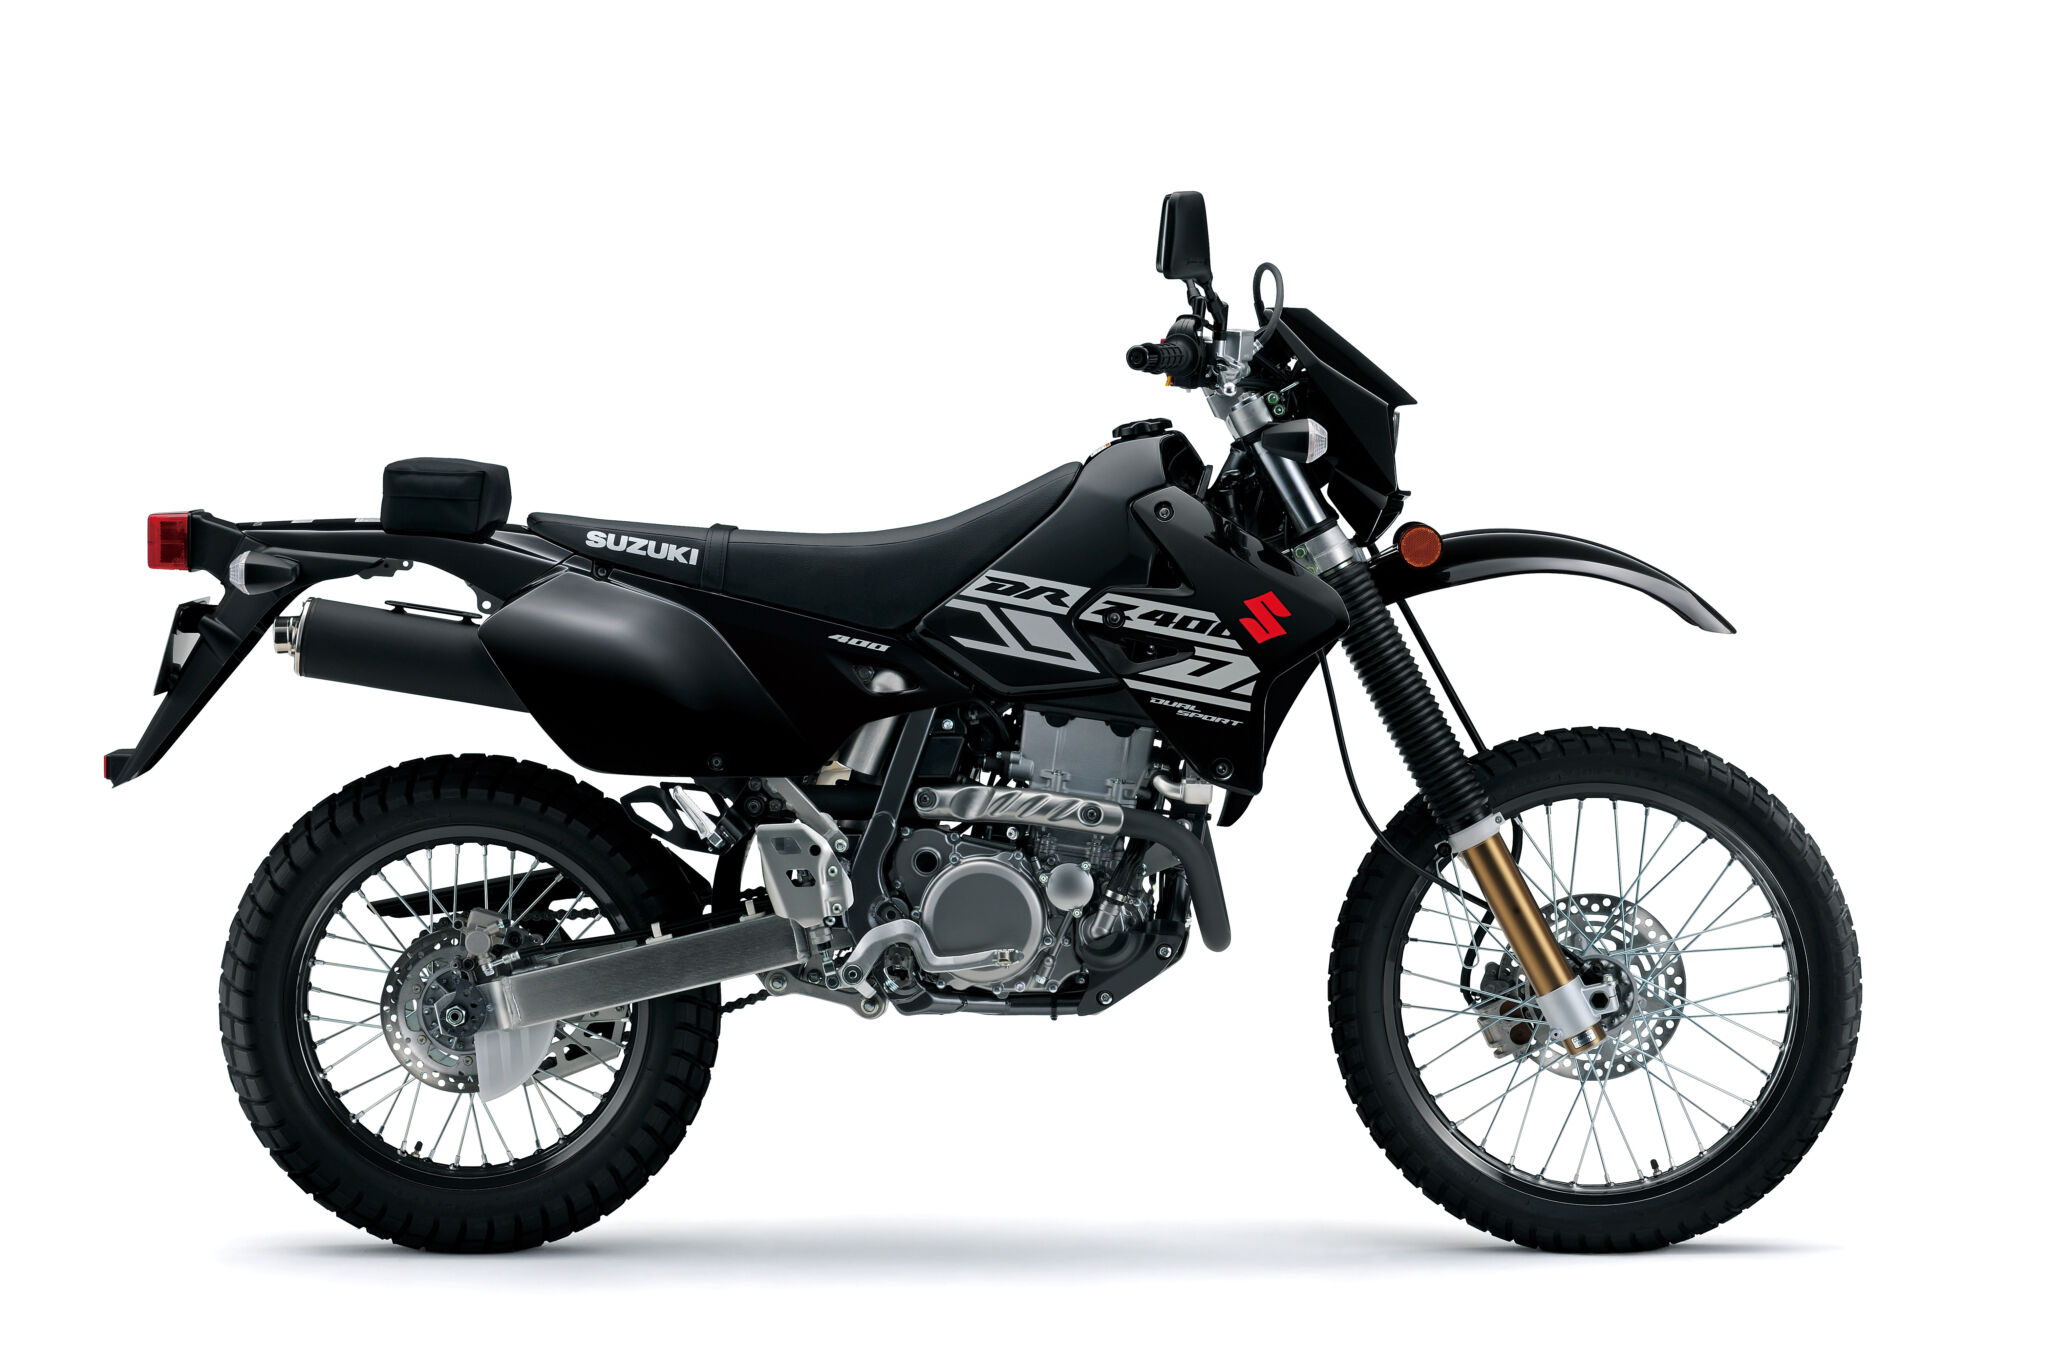 DRZ 400 S שחור